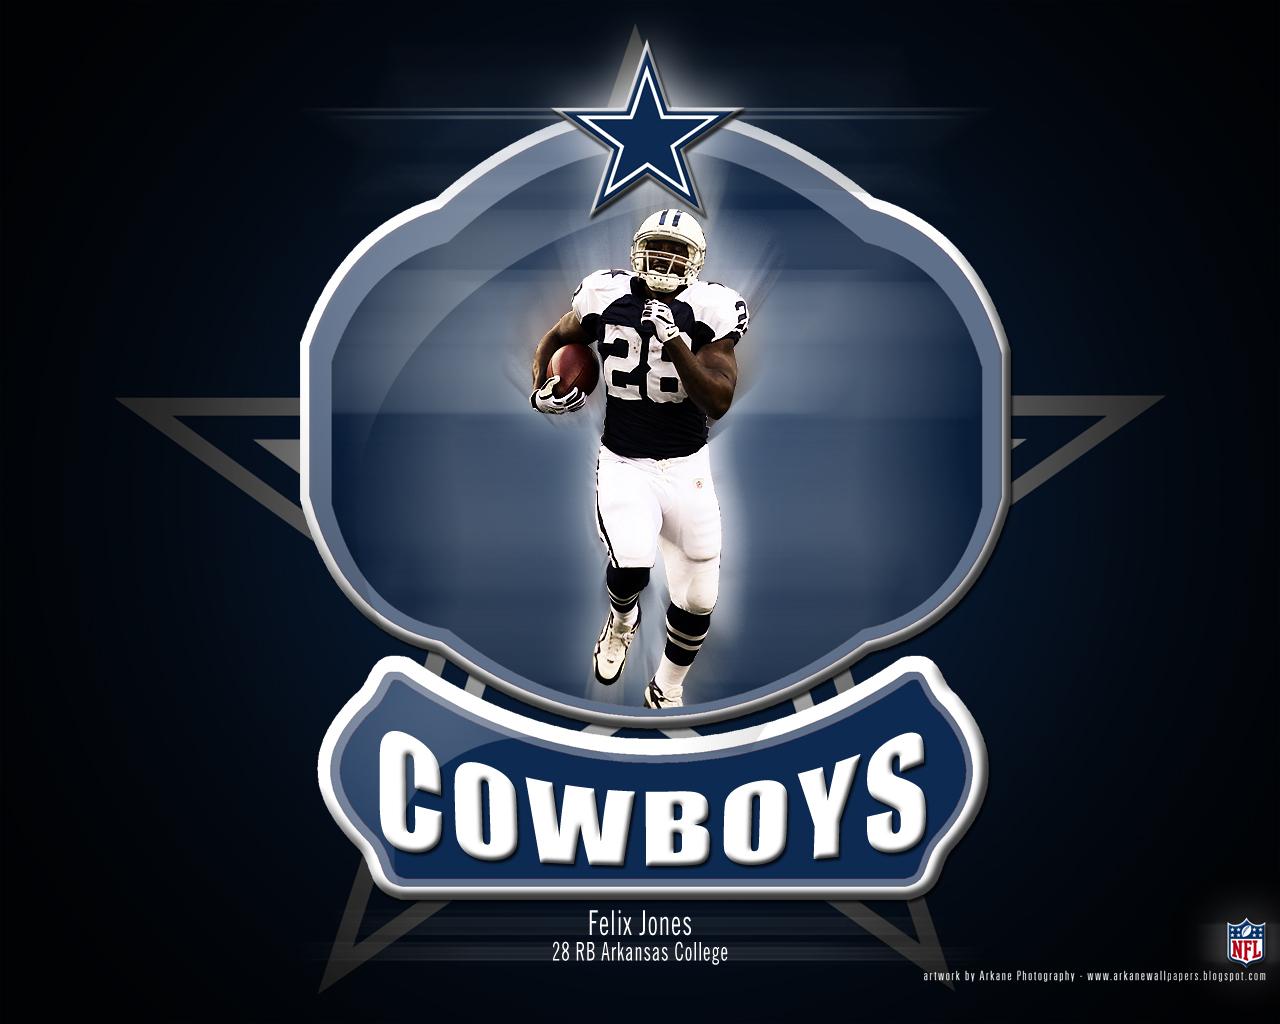 Dallas Cowboys Wallpapers Download PixelsTalk images about 1280x1024